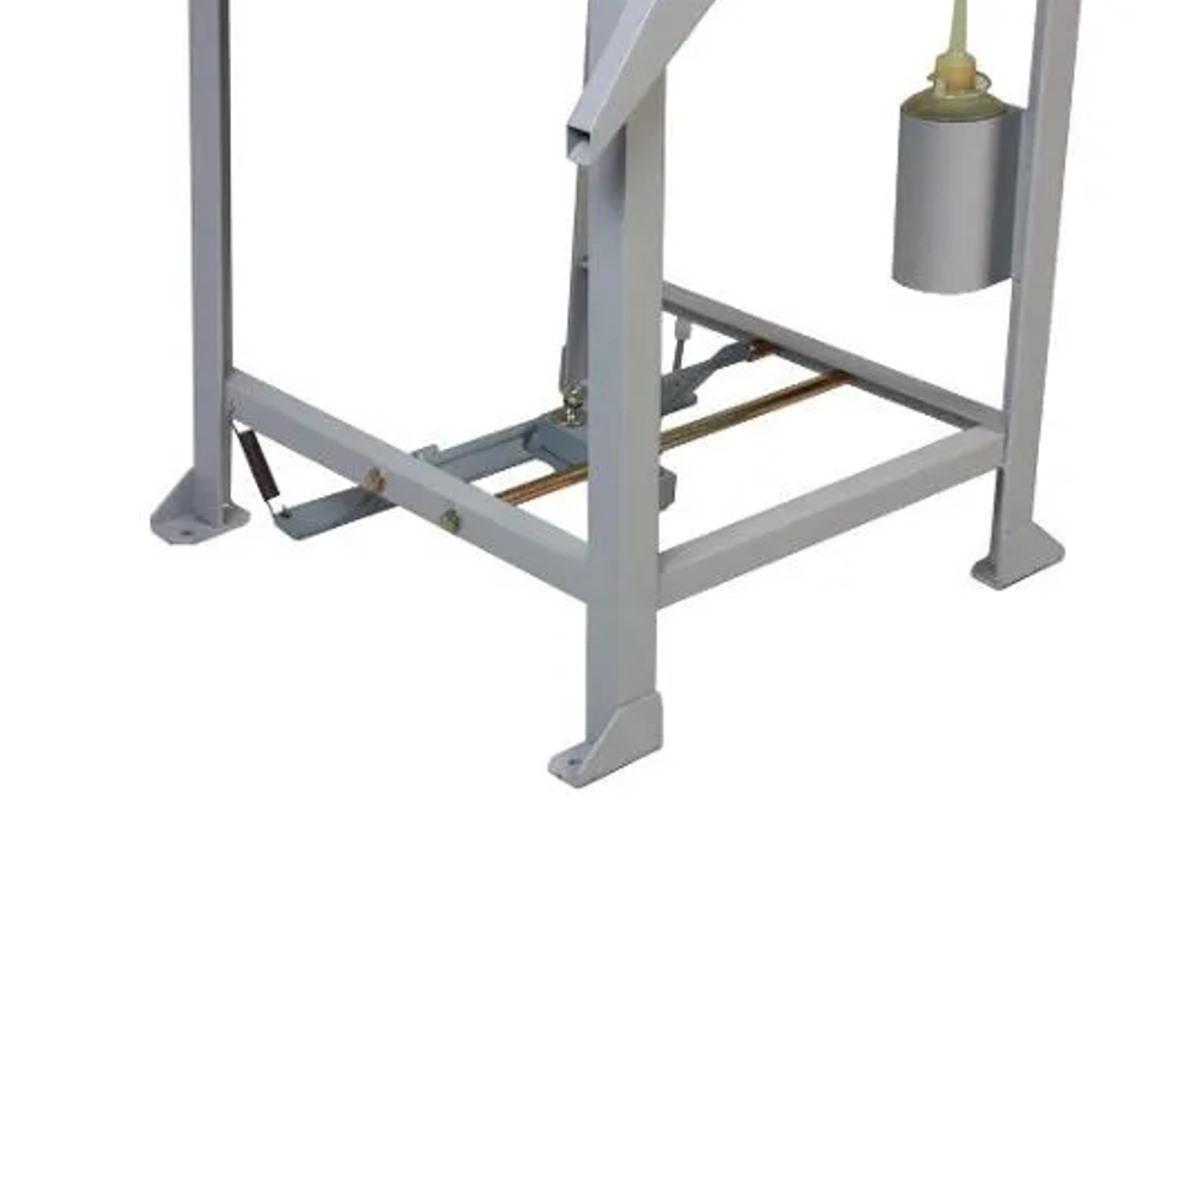 Encadernadora Perfuradora Elétrica Espiral Semi-industrial